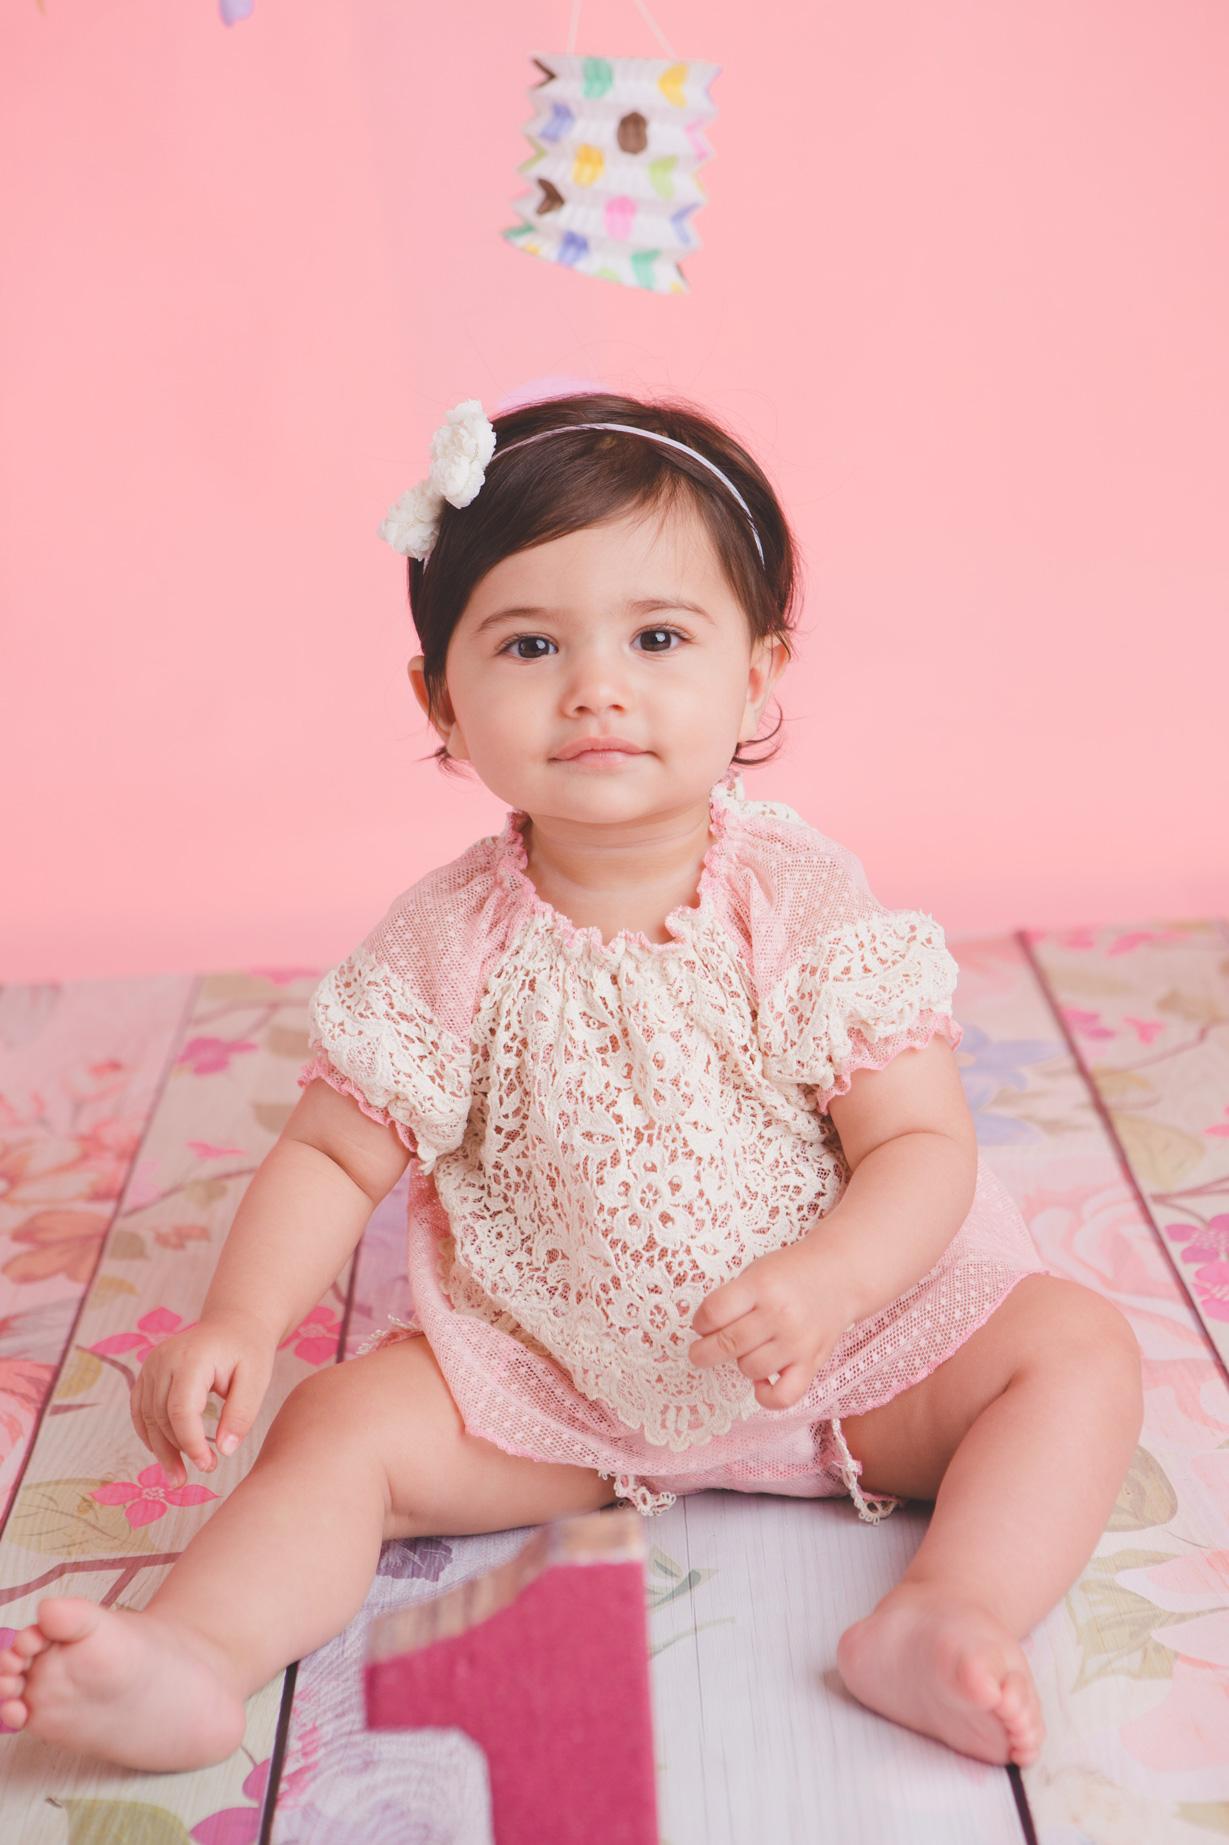 baby baby photography uae